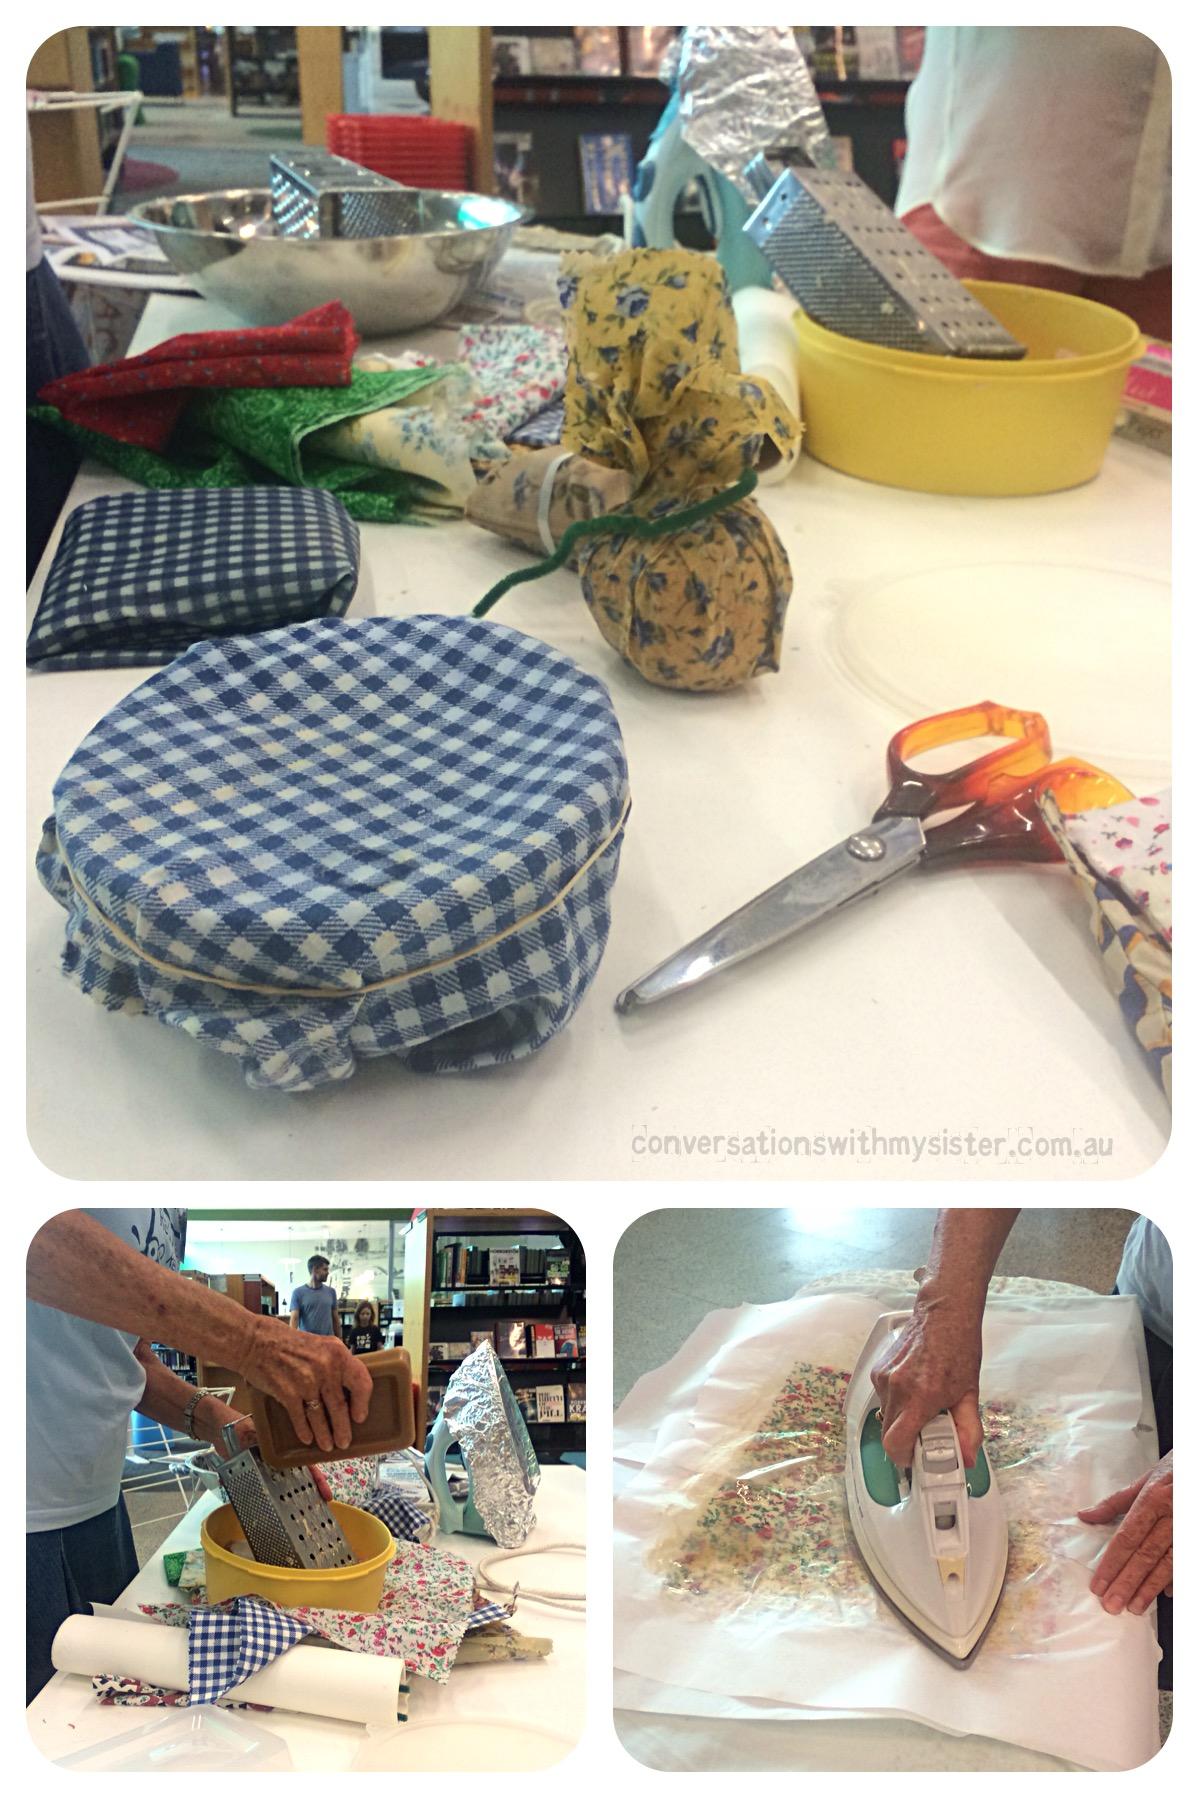 #DIY - It's A (Bees Wax) Wrap_conversationswithmysister.com.au